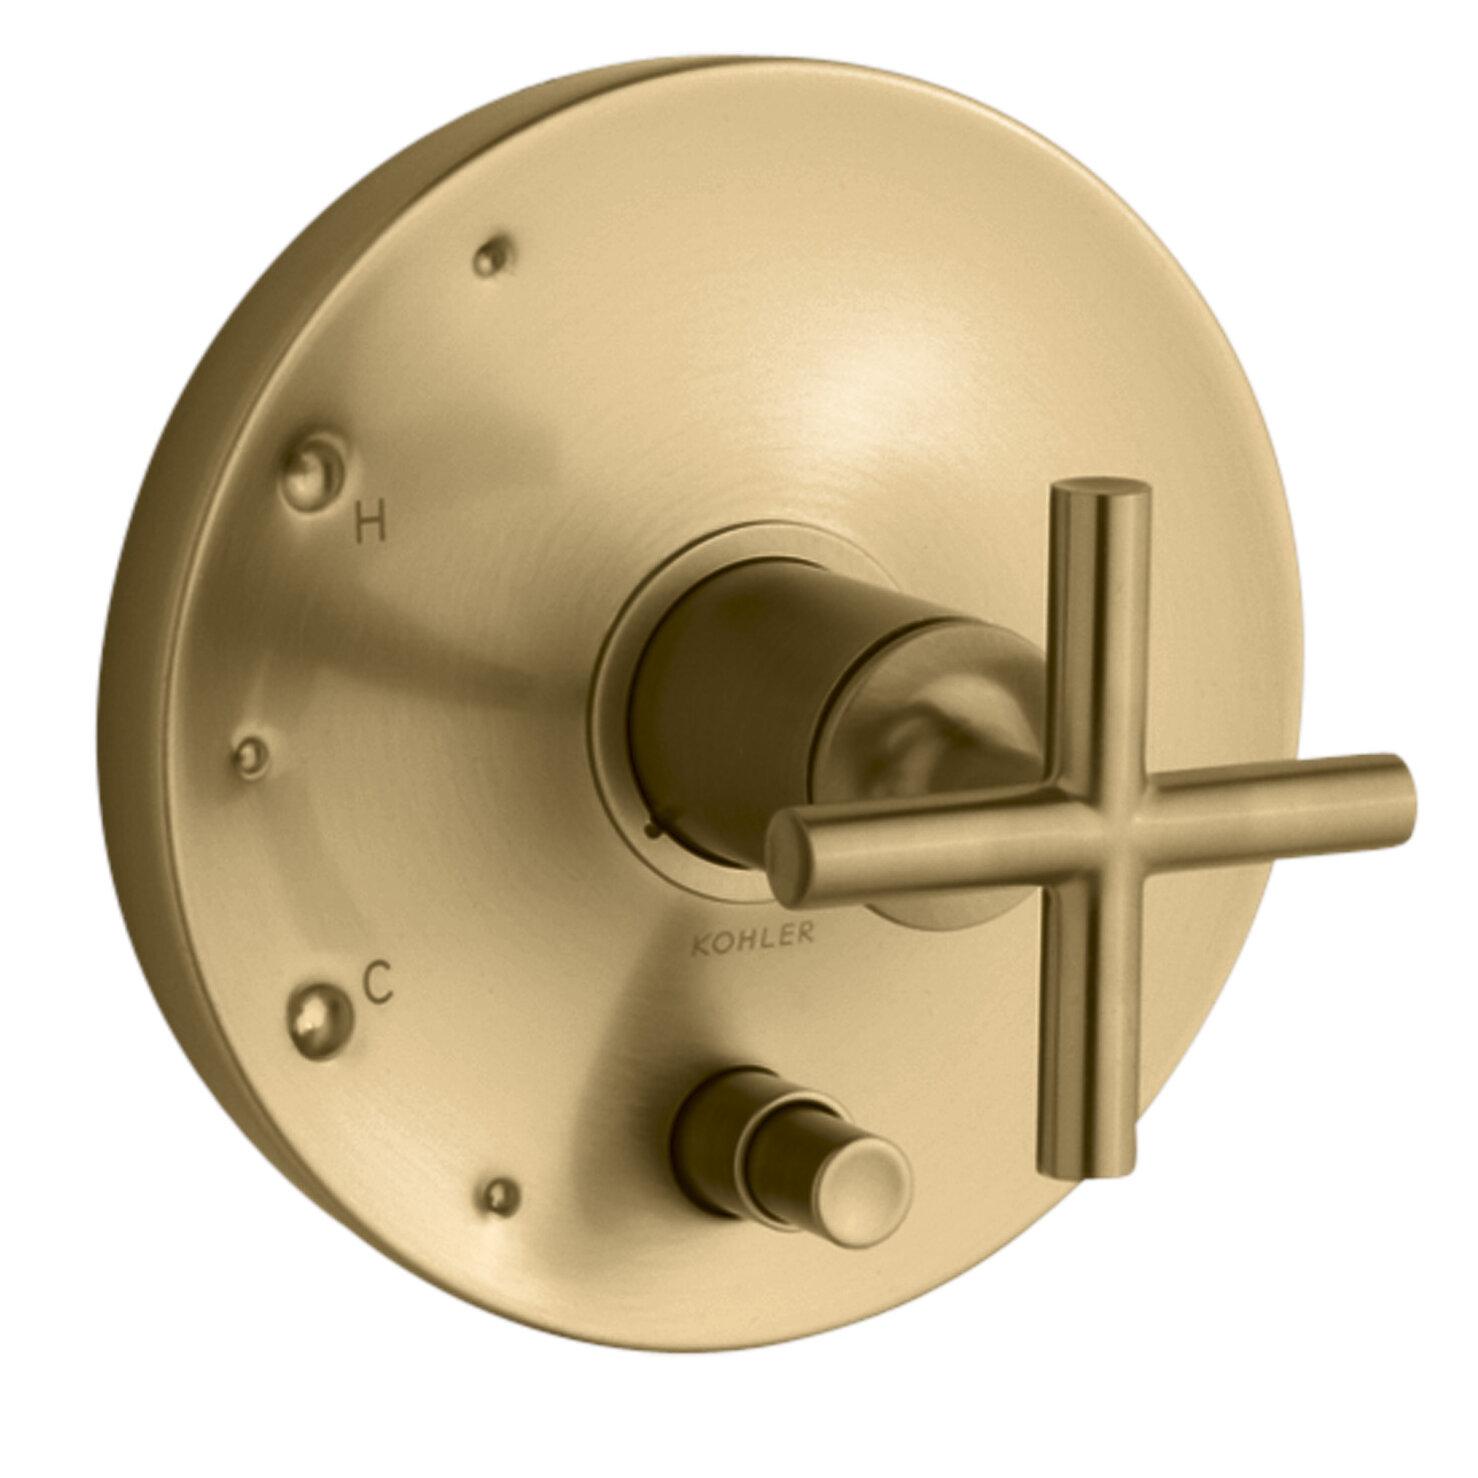 K-T14501-3-BGD,BL,BN Kohler Purist Rite-Temp Pressure-Balancing ...